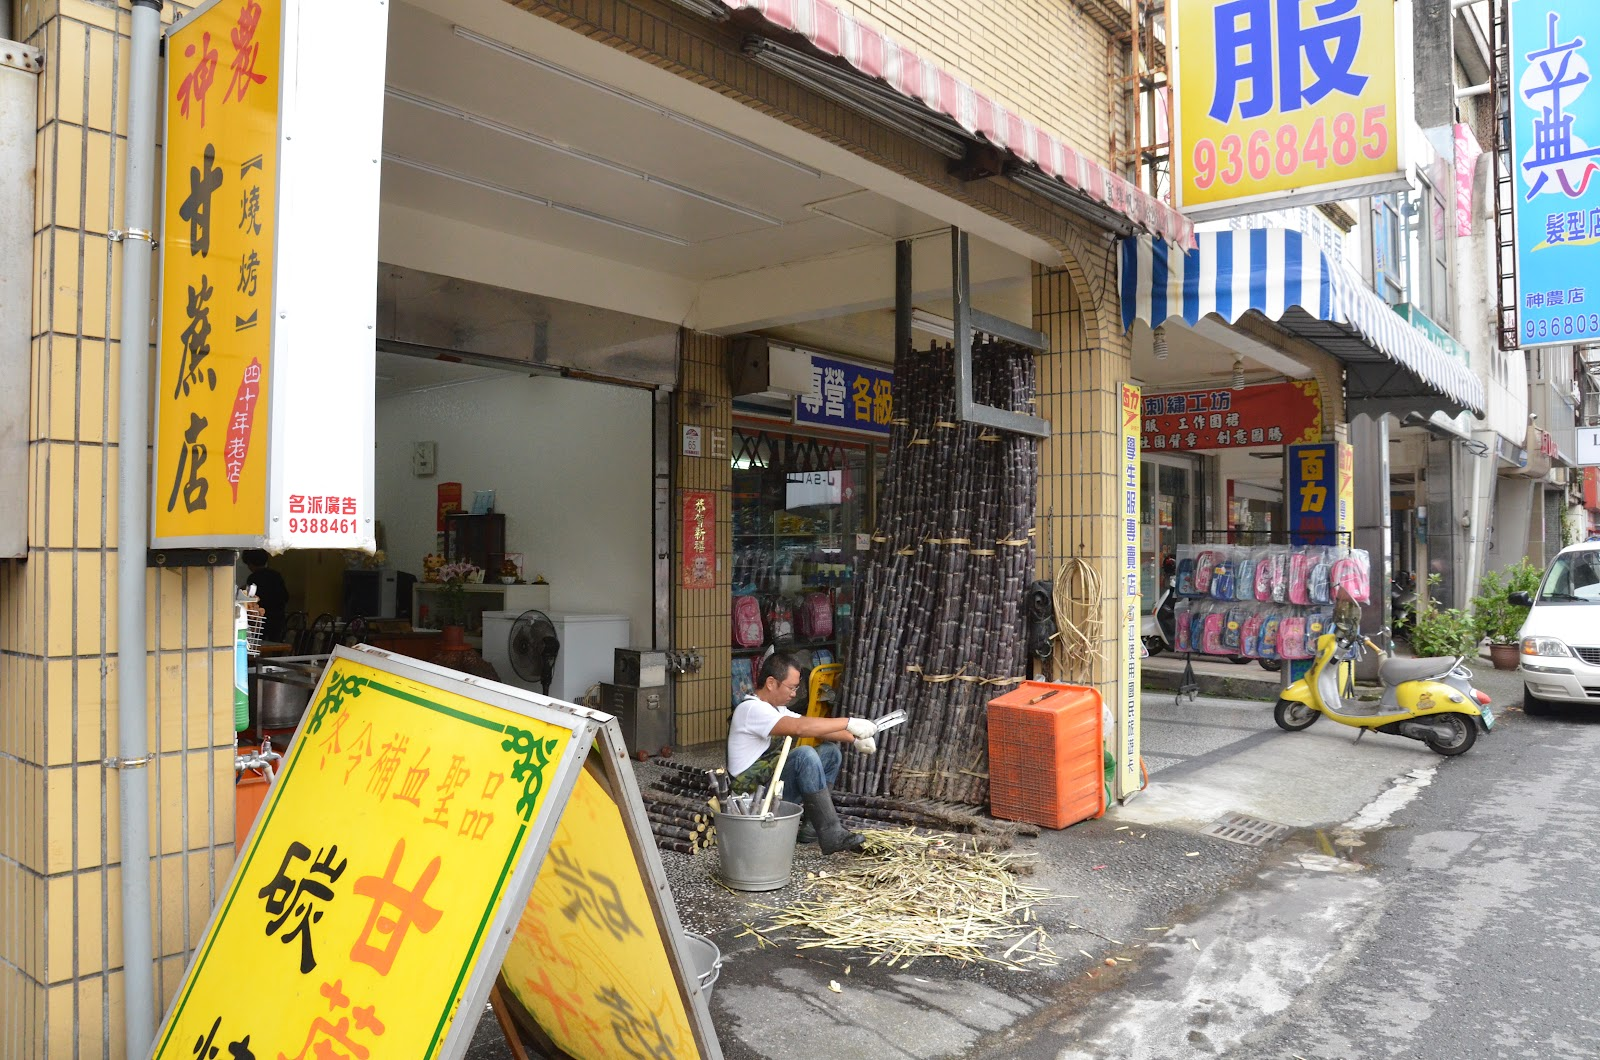 Rock N Code: 宜蘭零嘴 黑店冰&神農甘蔗&游家麻糬米糕